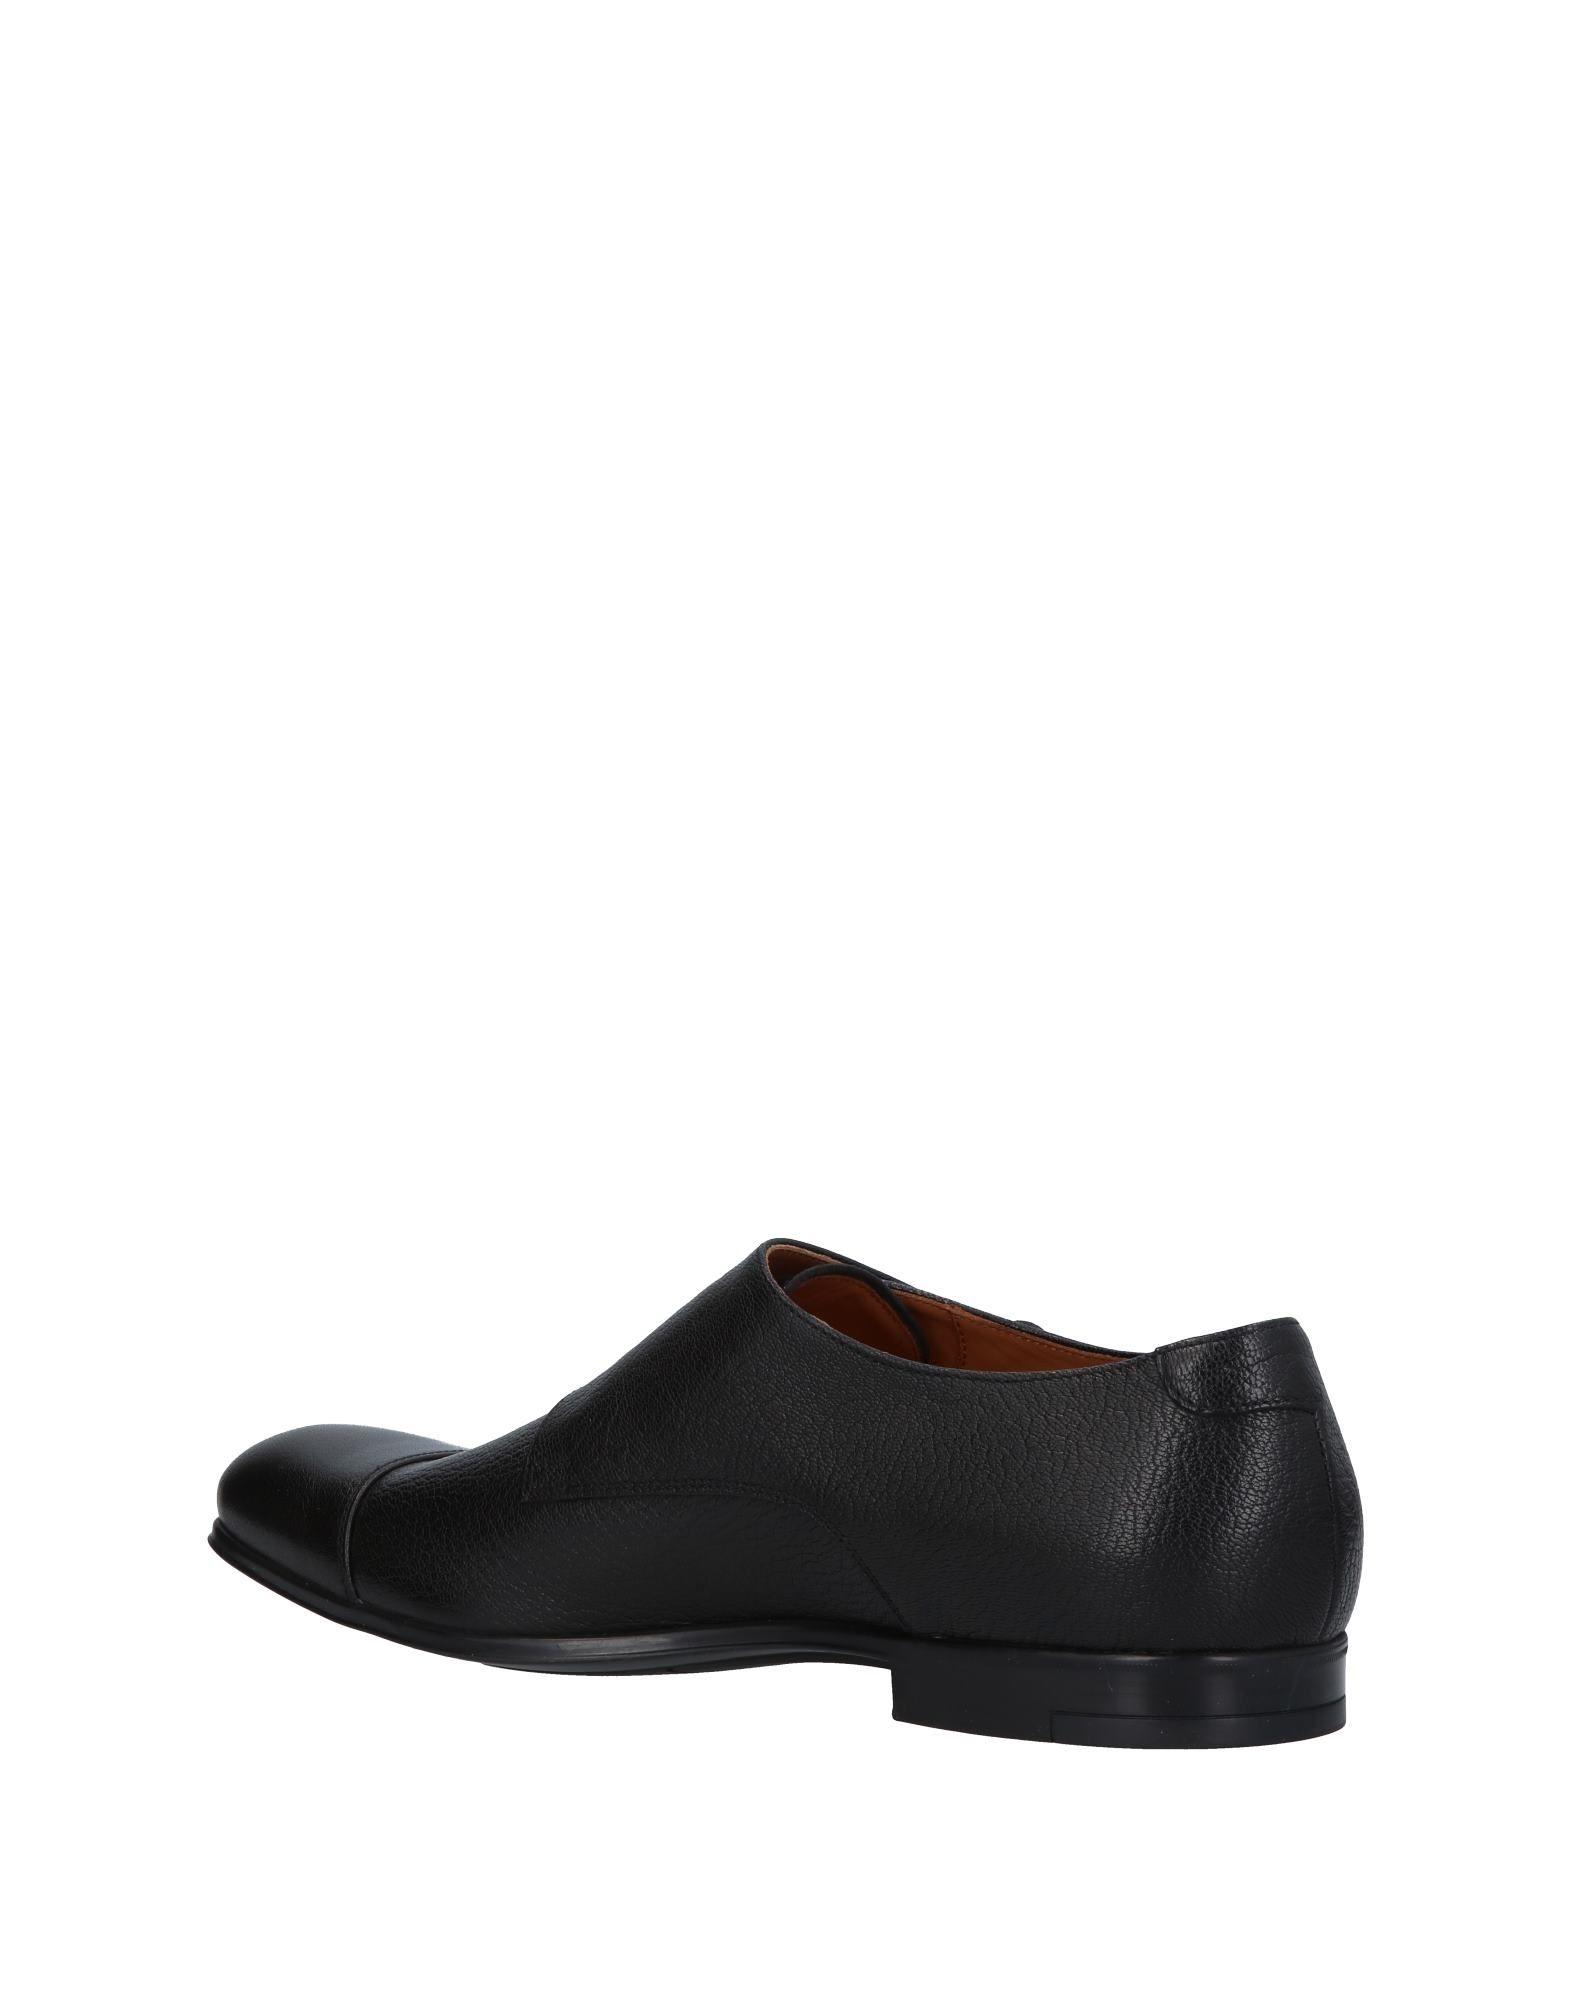 Doucal's Mokassins Herren Schuhe  11391445QO Heiße Schuhe Herren d222e8